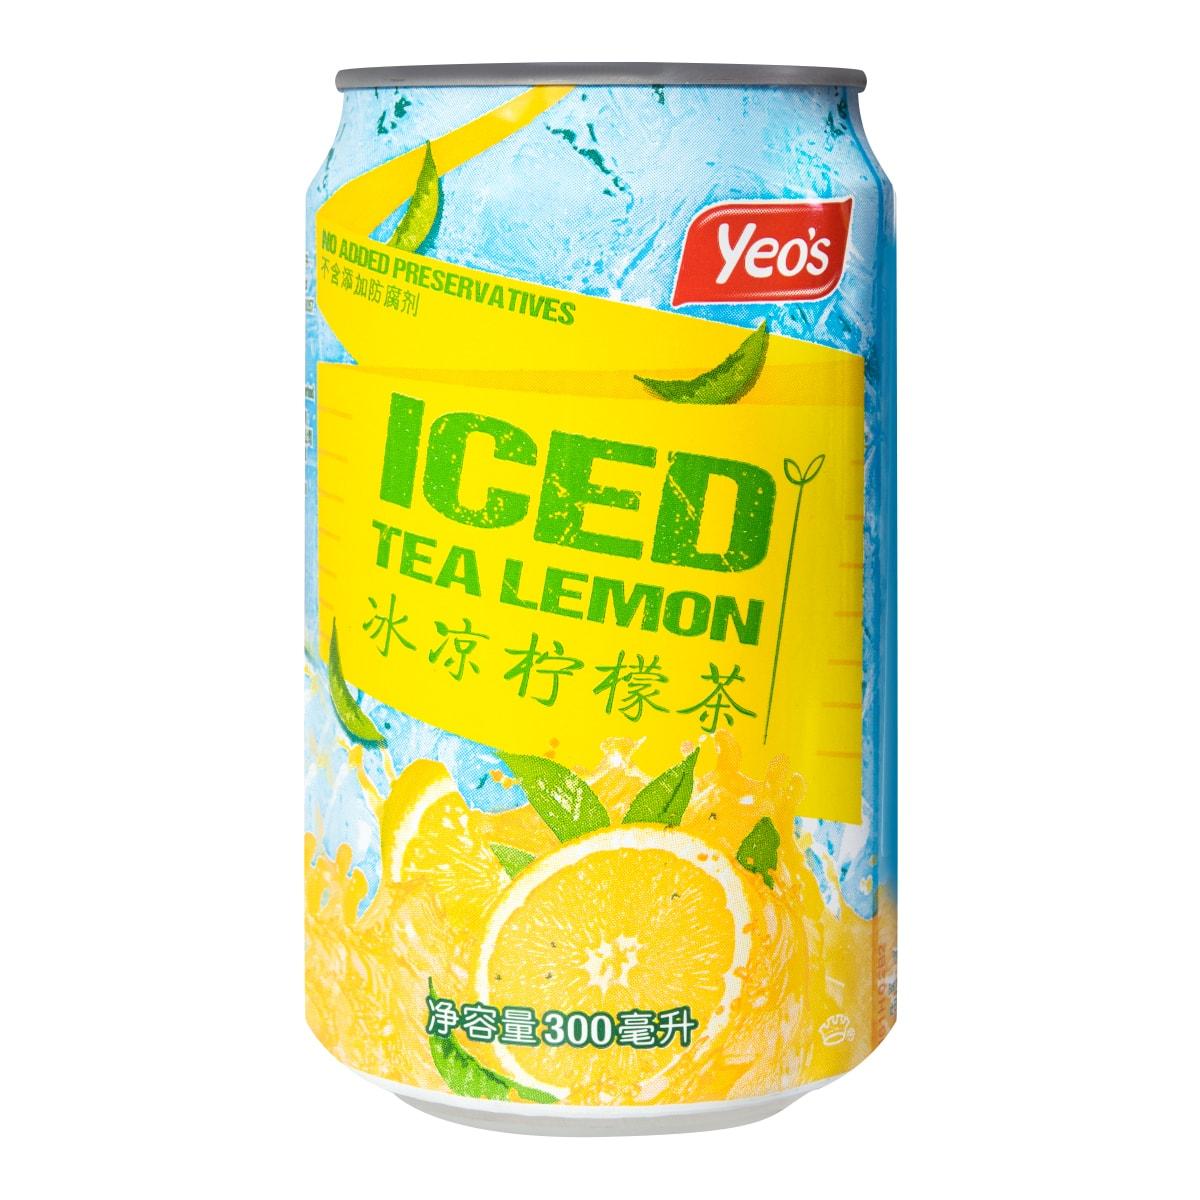 YEO'S Iced Lemon Tea Drink 300ml